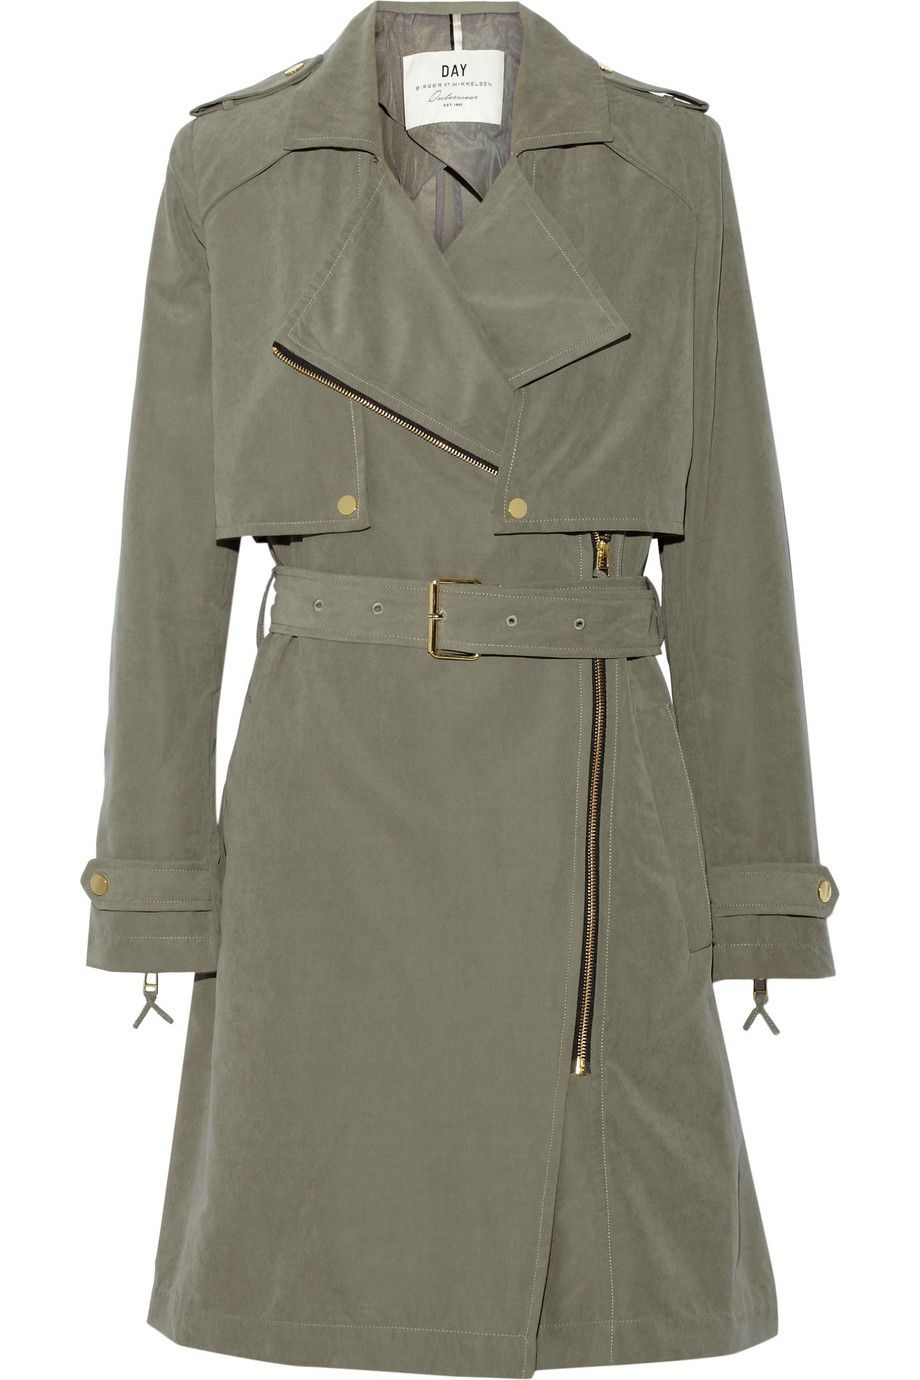 30e6eed6d17 DAY Birger et Mikkelsen | Day Go brushed-twill trench coat |  NET-A-PORTER.COM